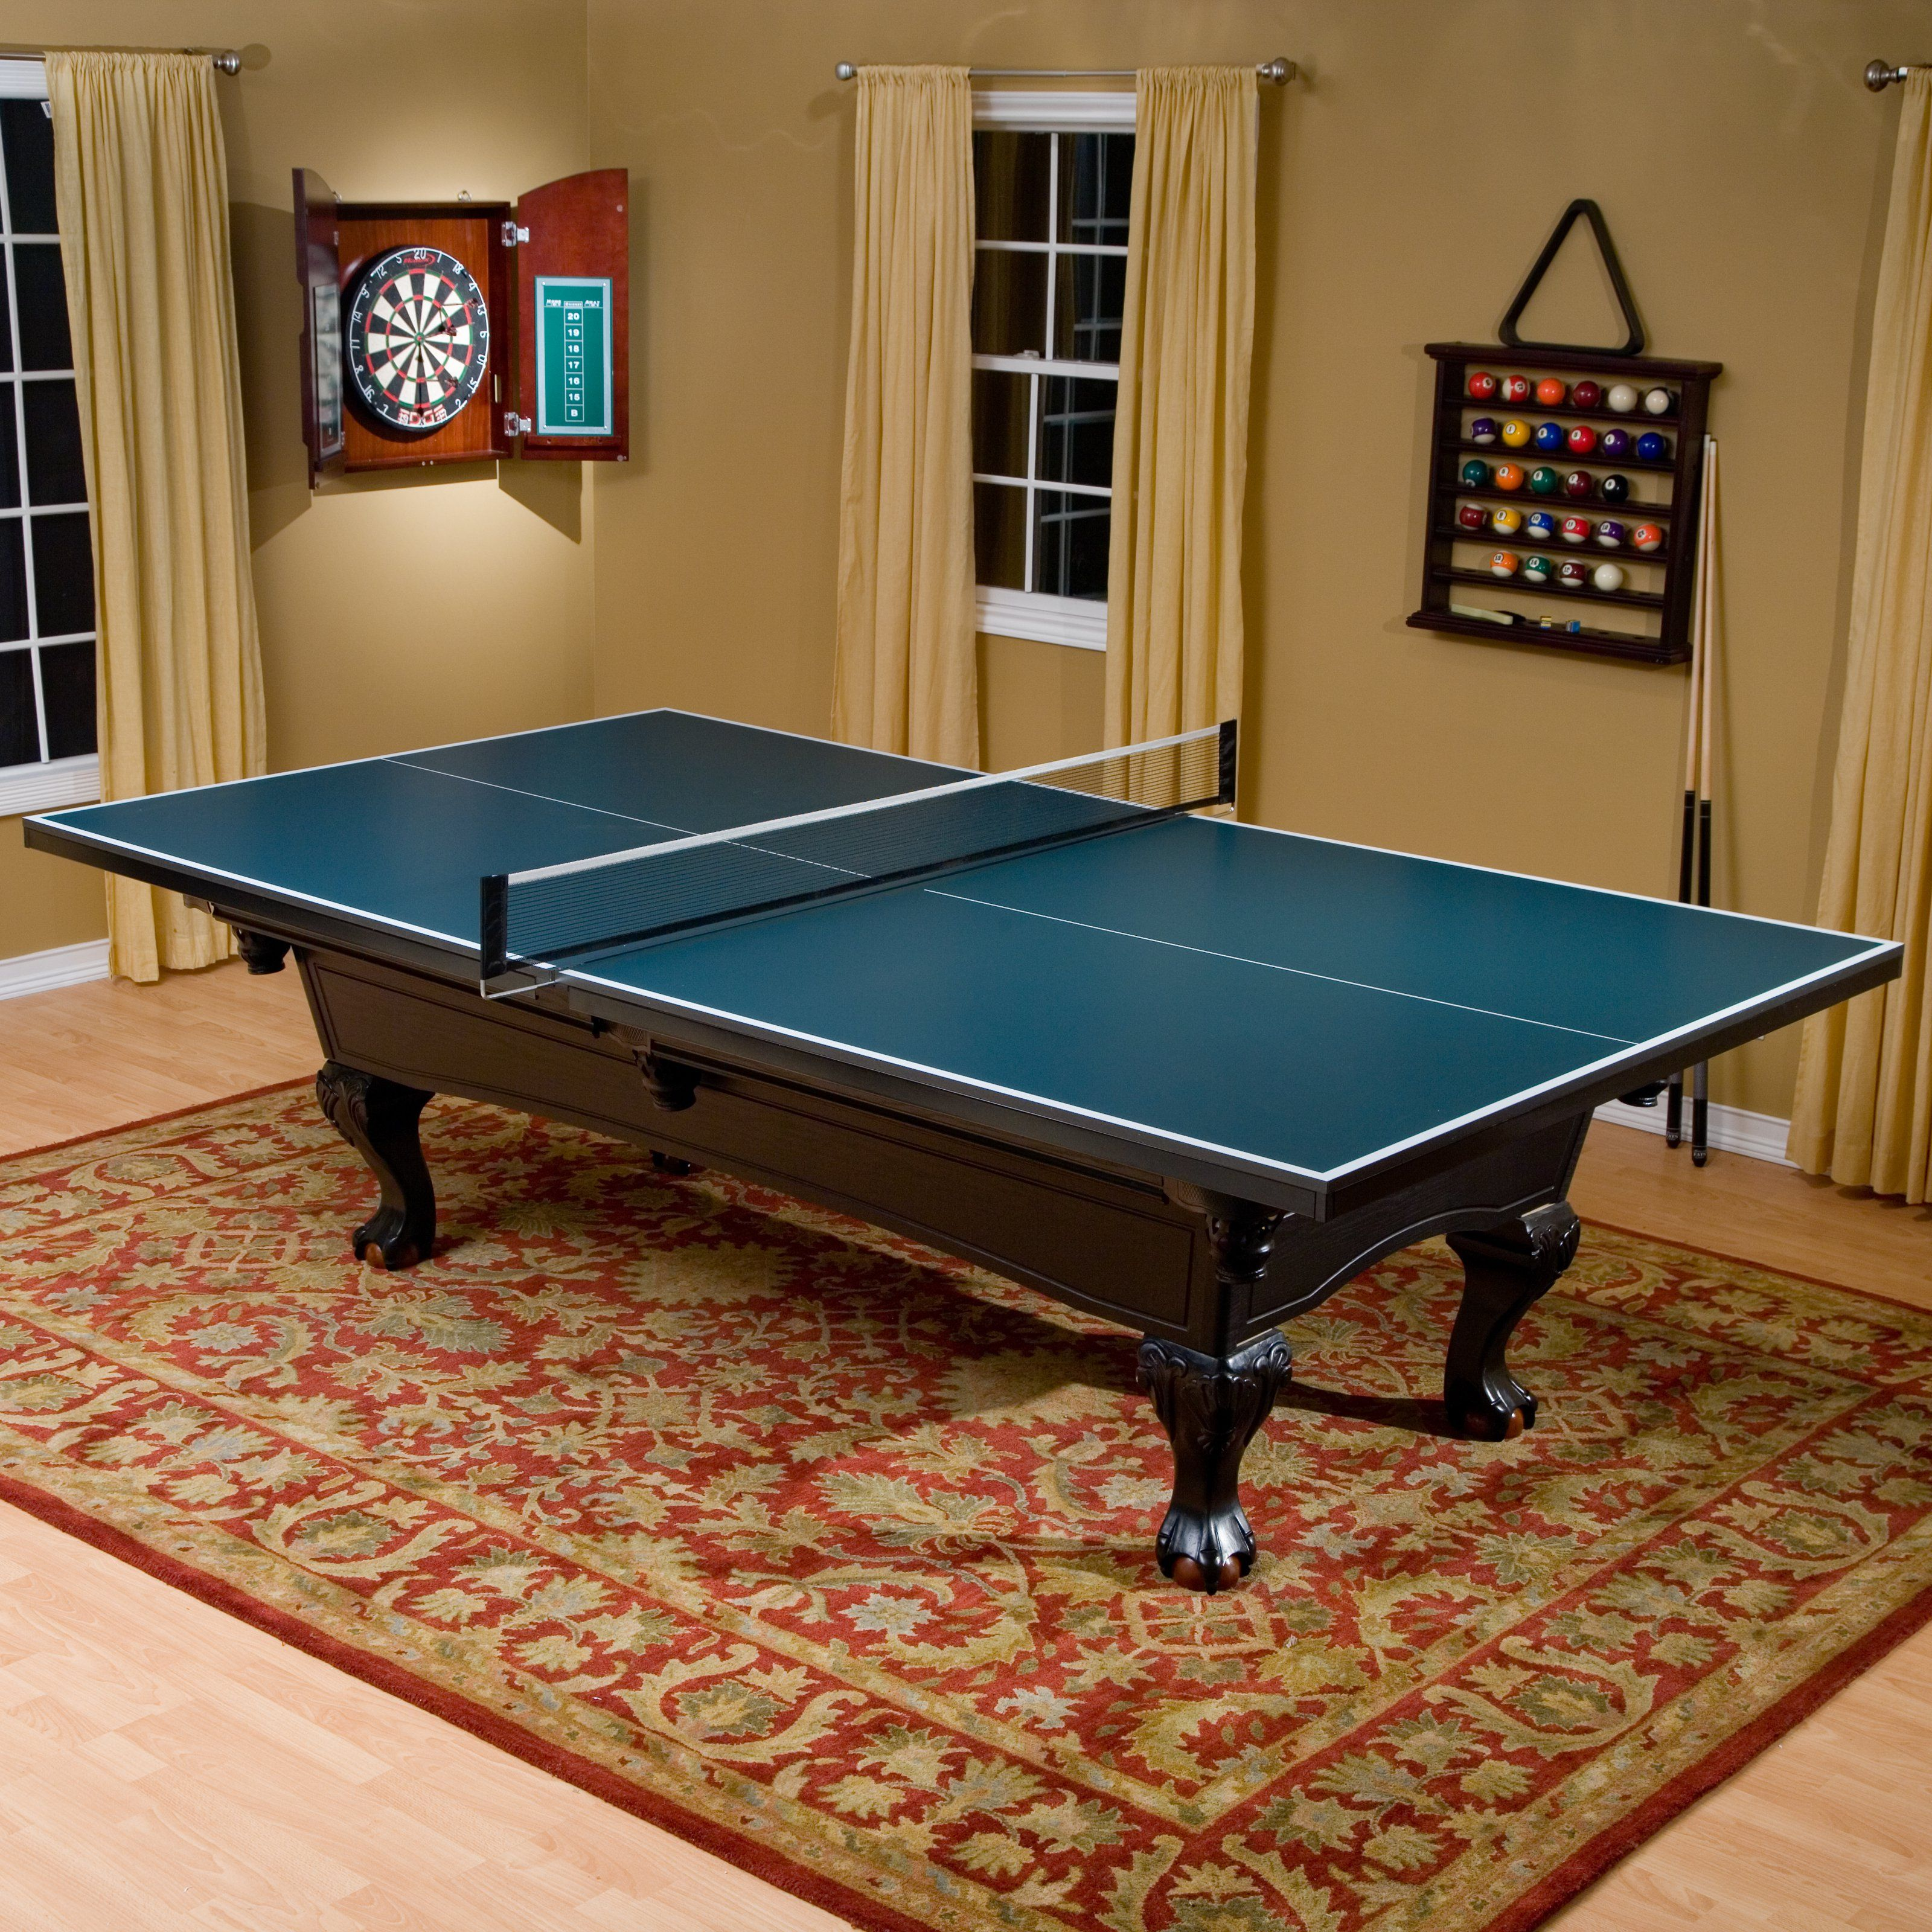 Table Tennis Conversion Top With 2 Player Racket Set   PT16BDX 201 W/KIT